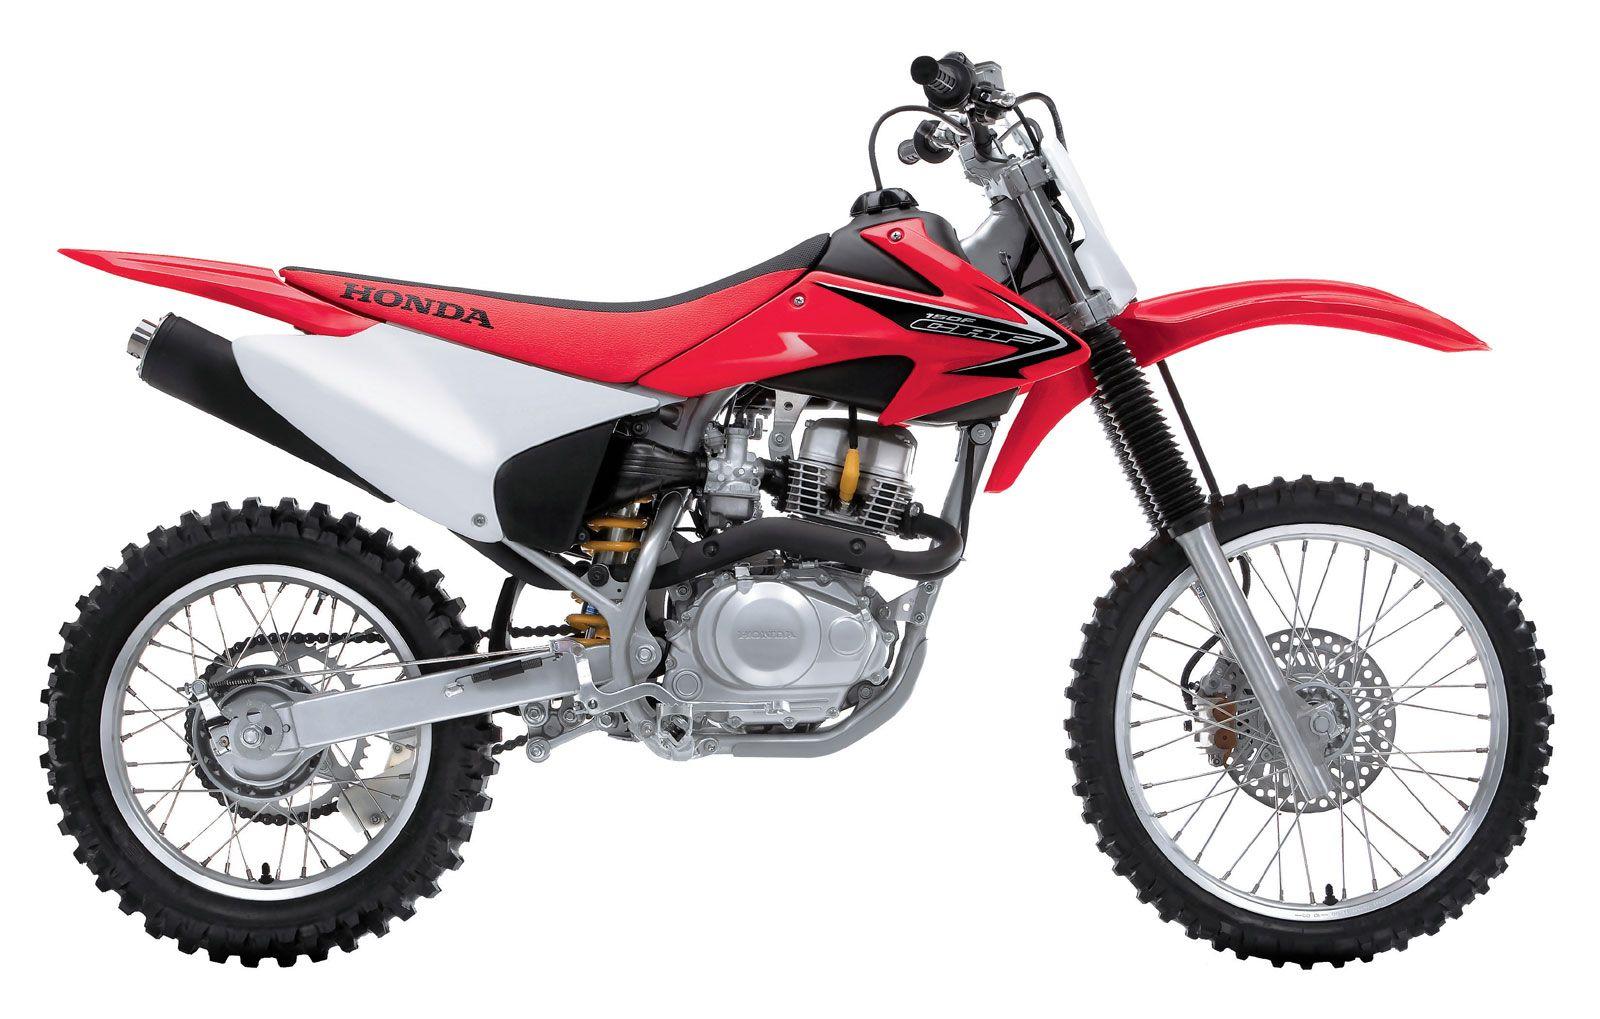 Honda Crf150f Fun Lil Guy Not Enough Power Though Only A 150 Honda 150cc Motorcycle 150cc